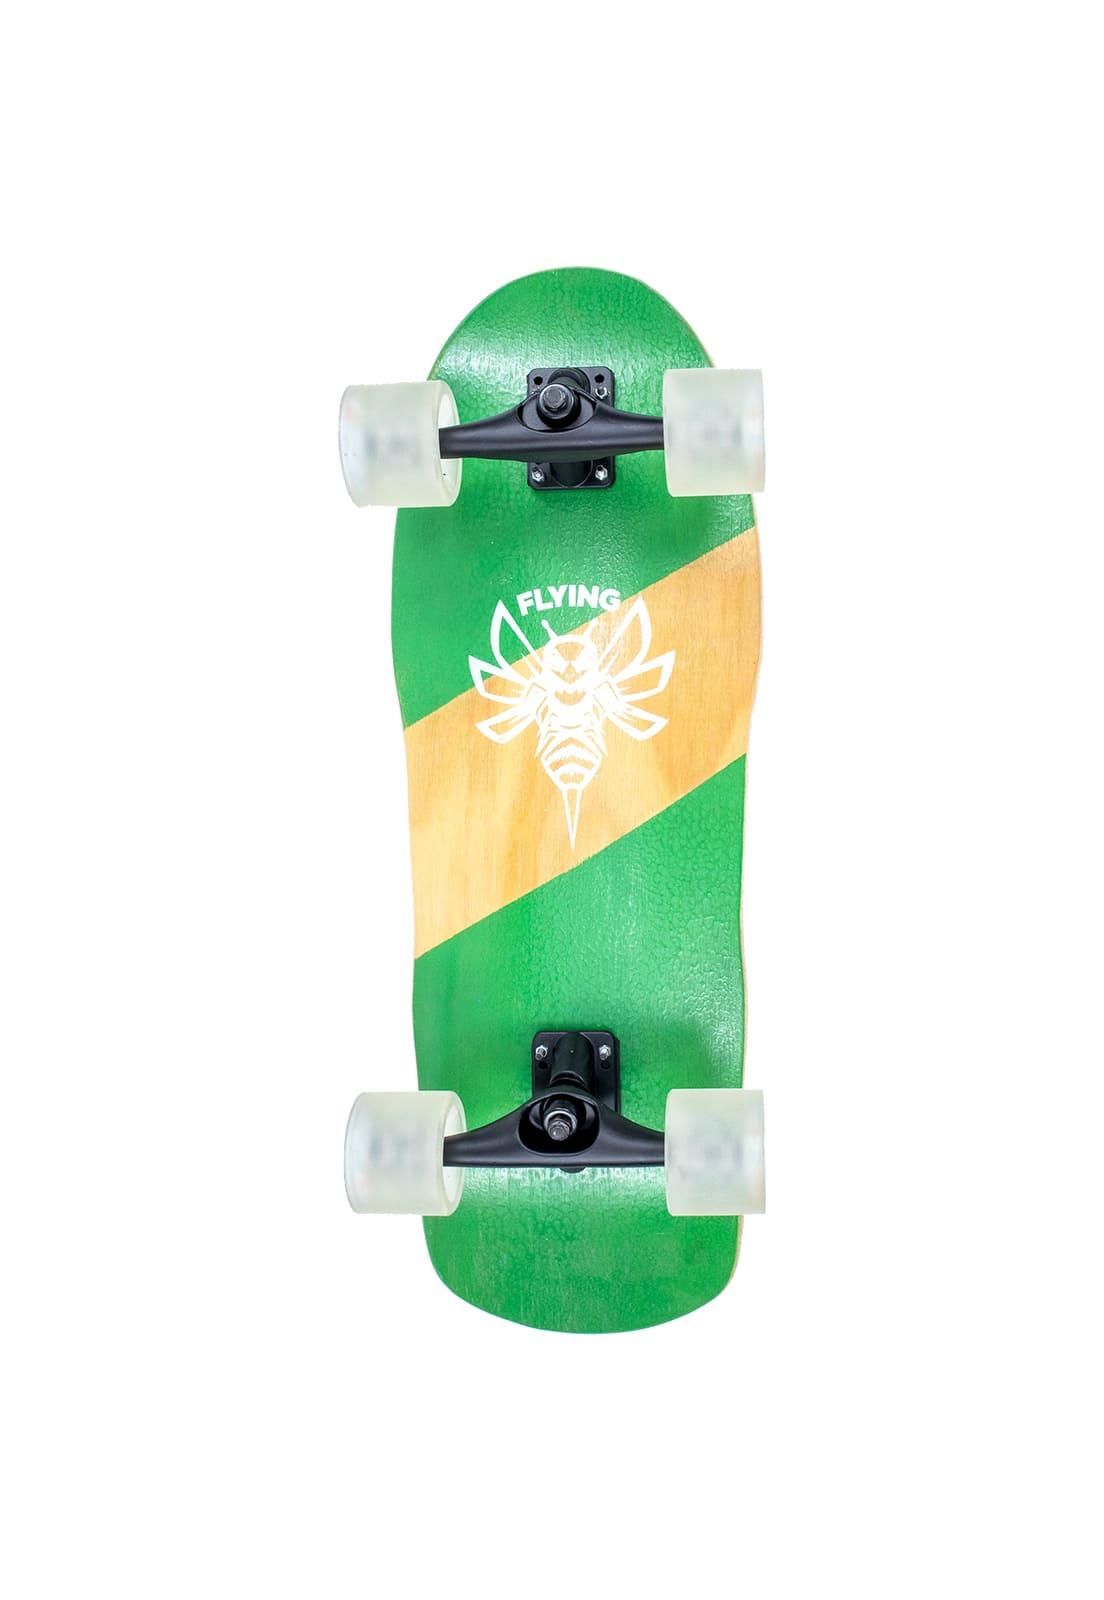 "Skate Simulador de Surf Flying Importado 9.8"" Truck 160mm"